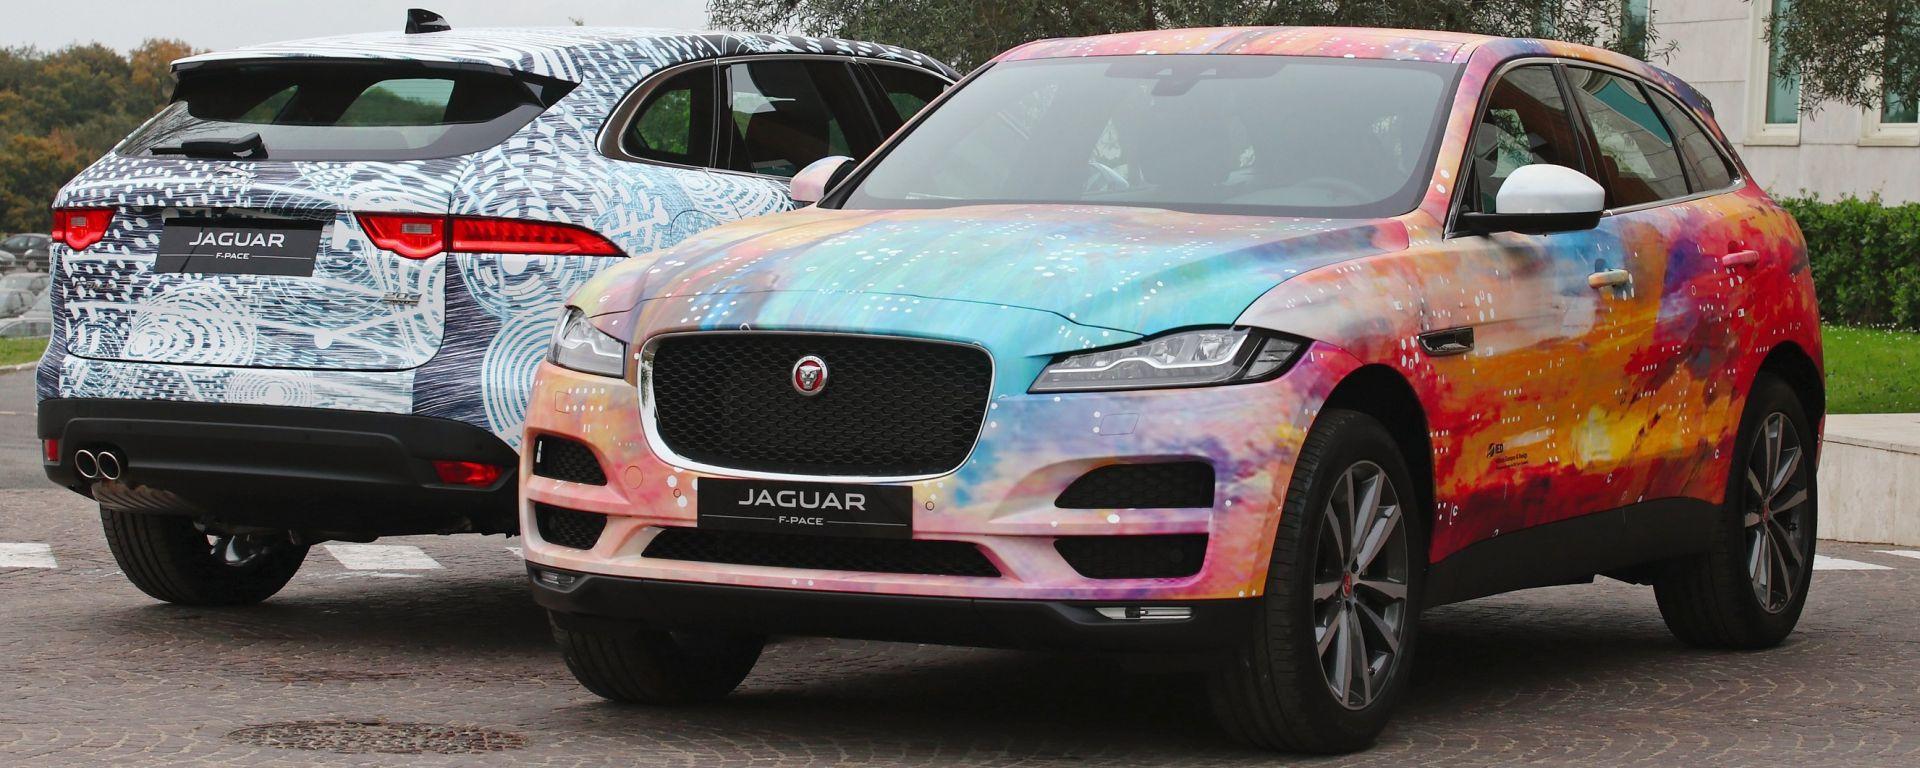 Jaguar: al FuoriSalone 2016 insieme a IED Torino